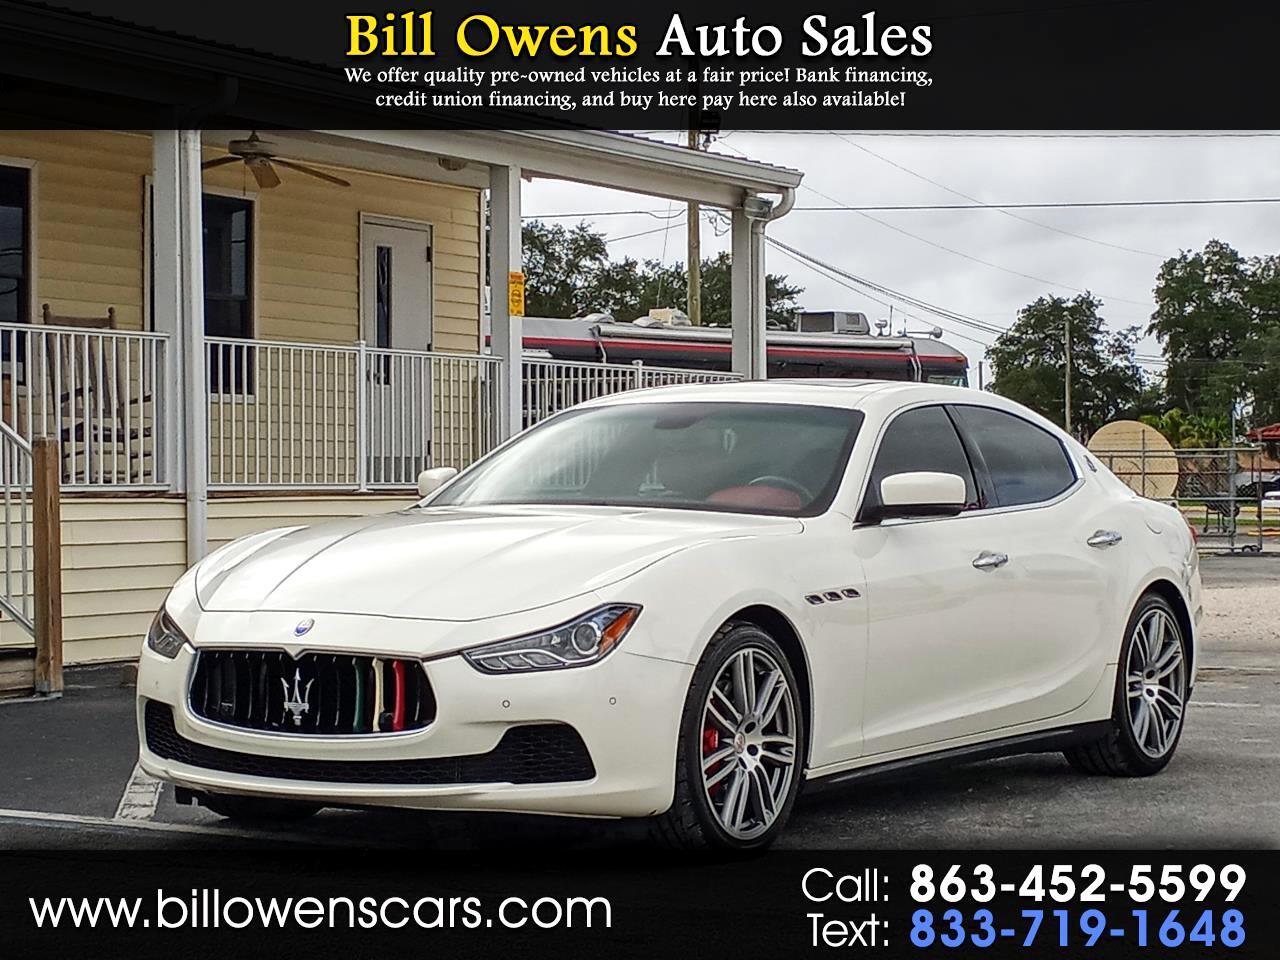 Maserati Ghibli 4dr Sdn S Q4 2014